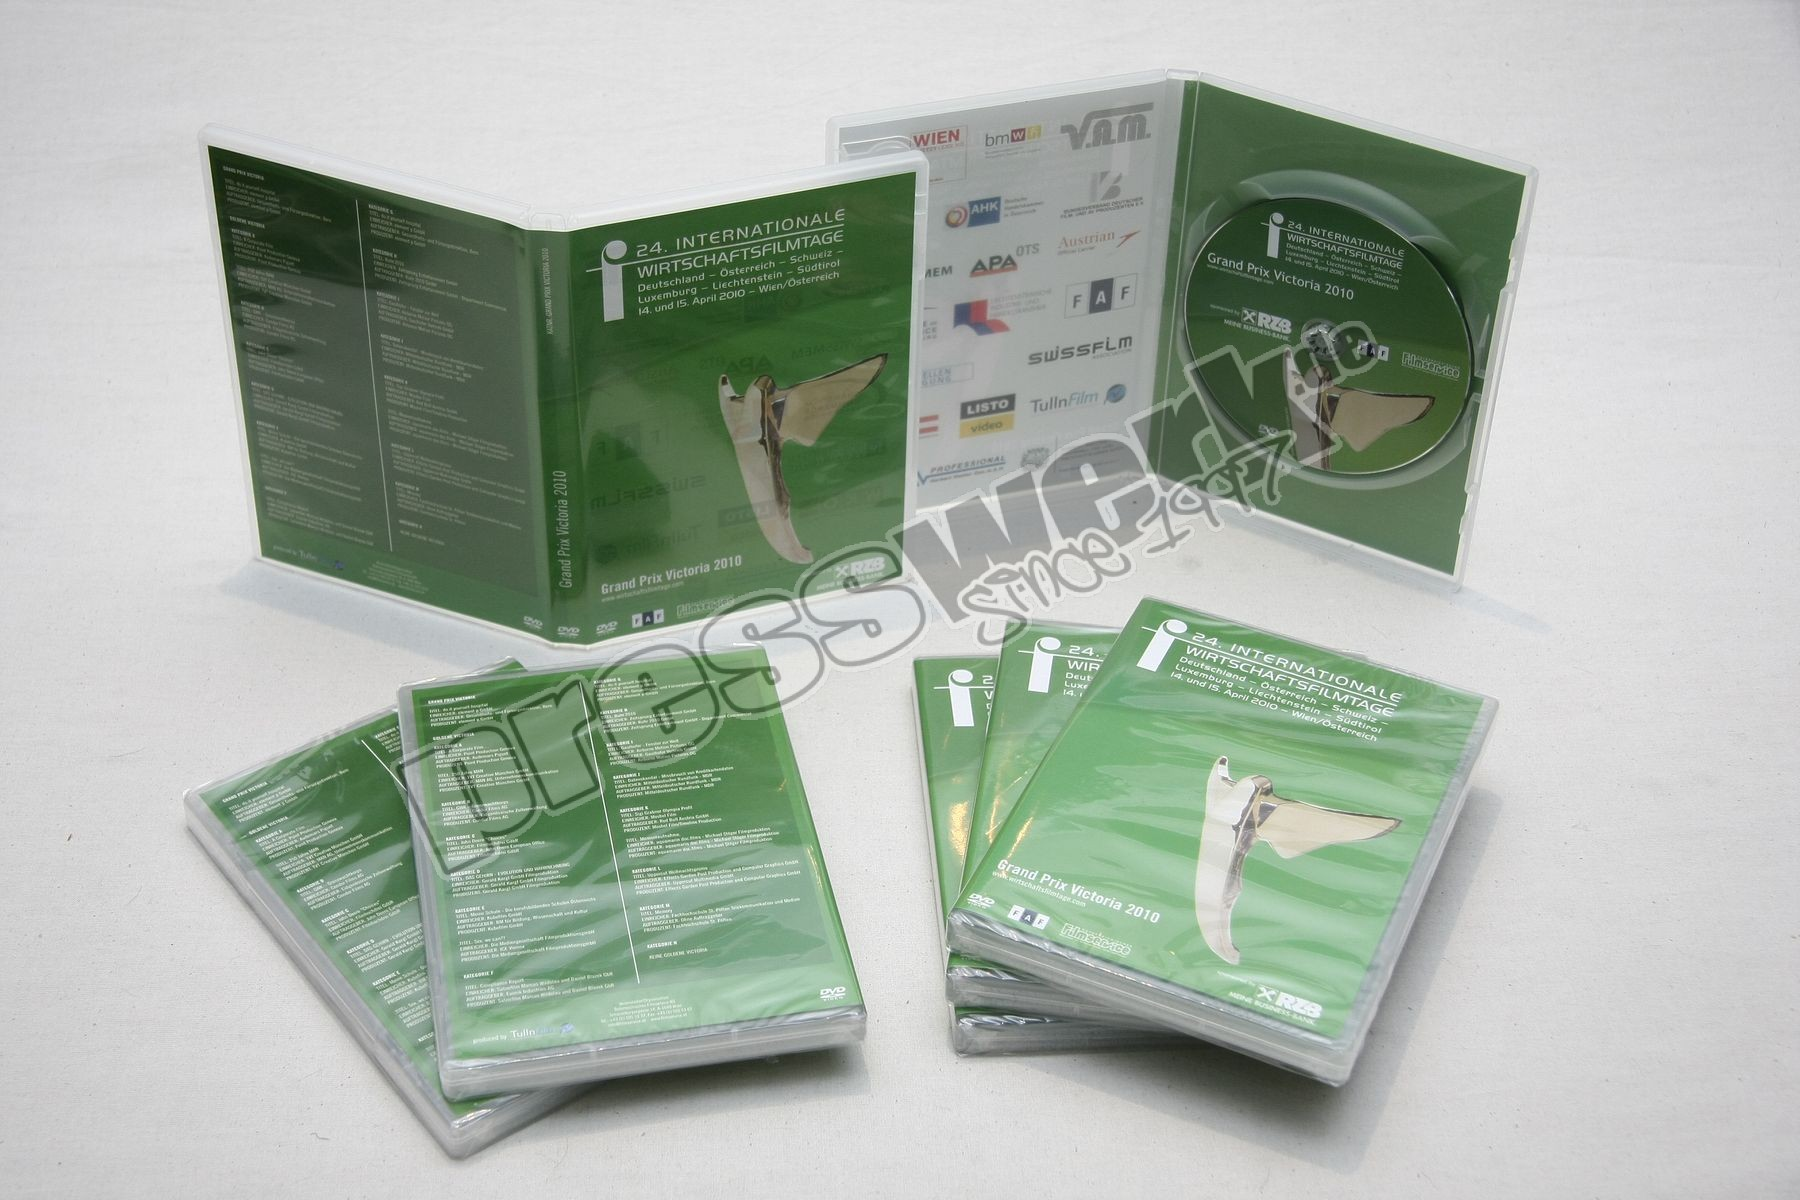 presswerk CD DVD BluRay Vinyl pressen